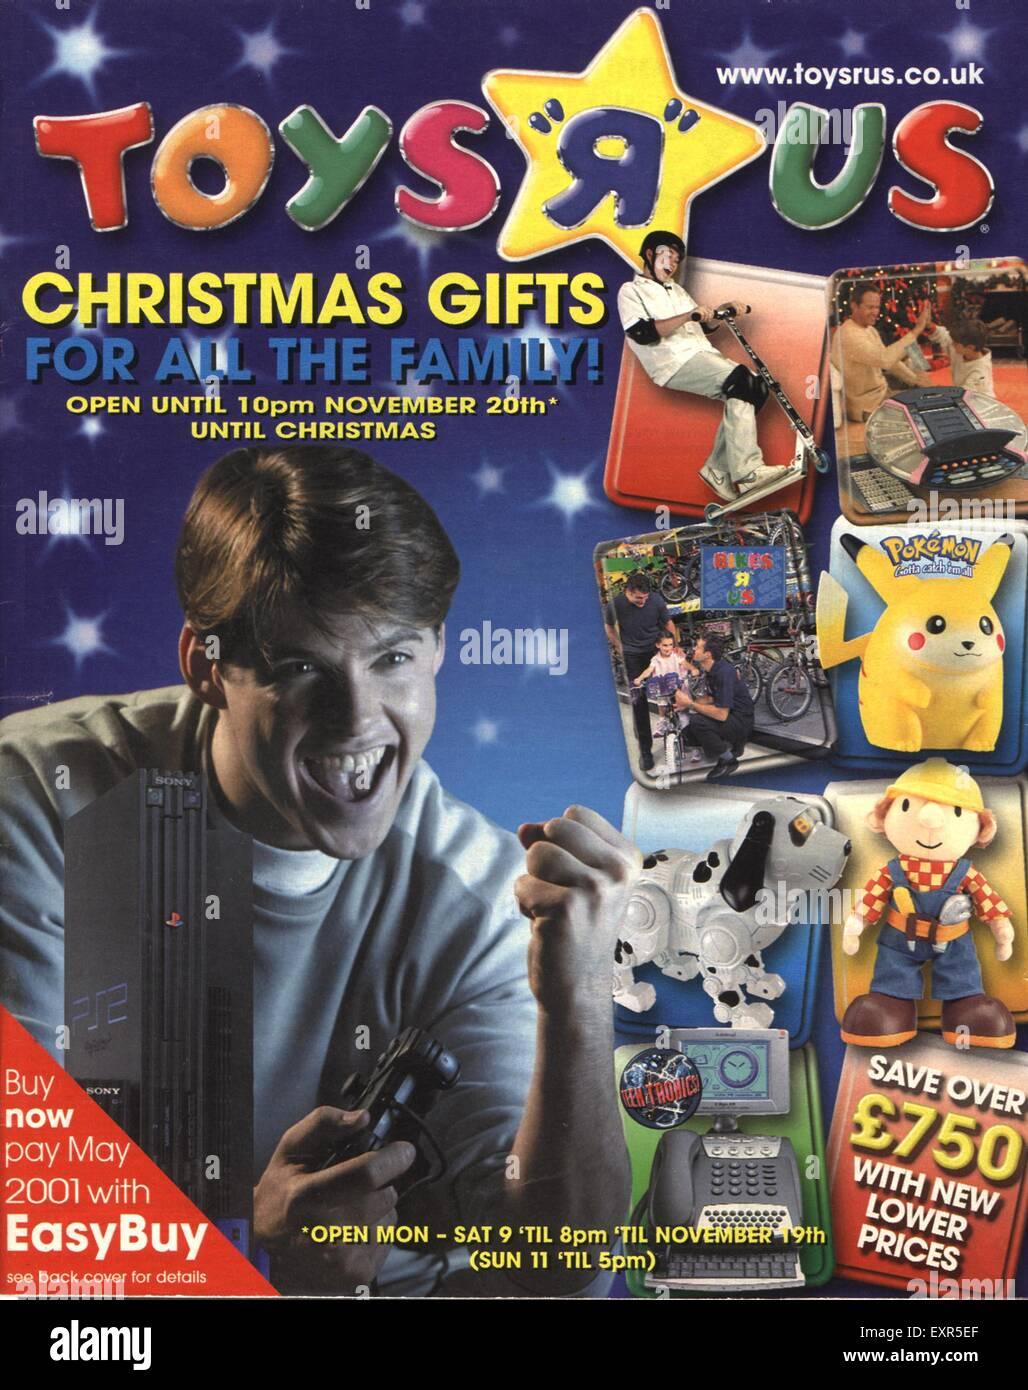 2000s uk toys r us magazine advert